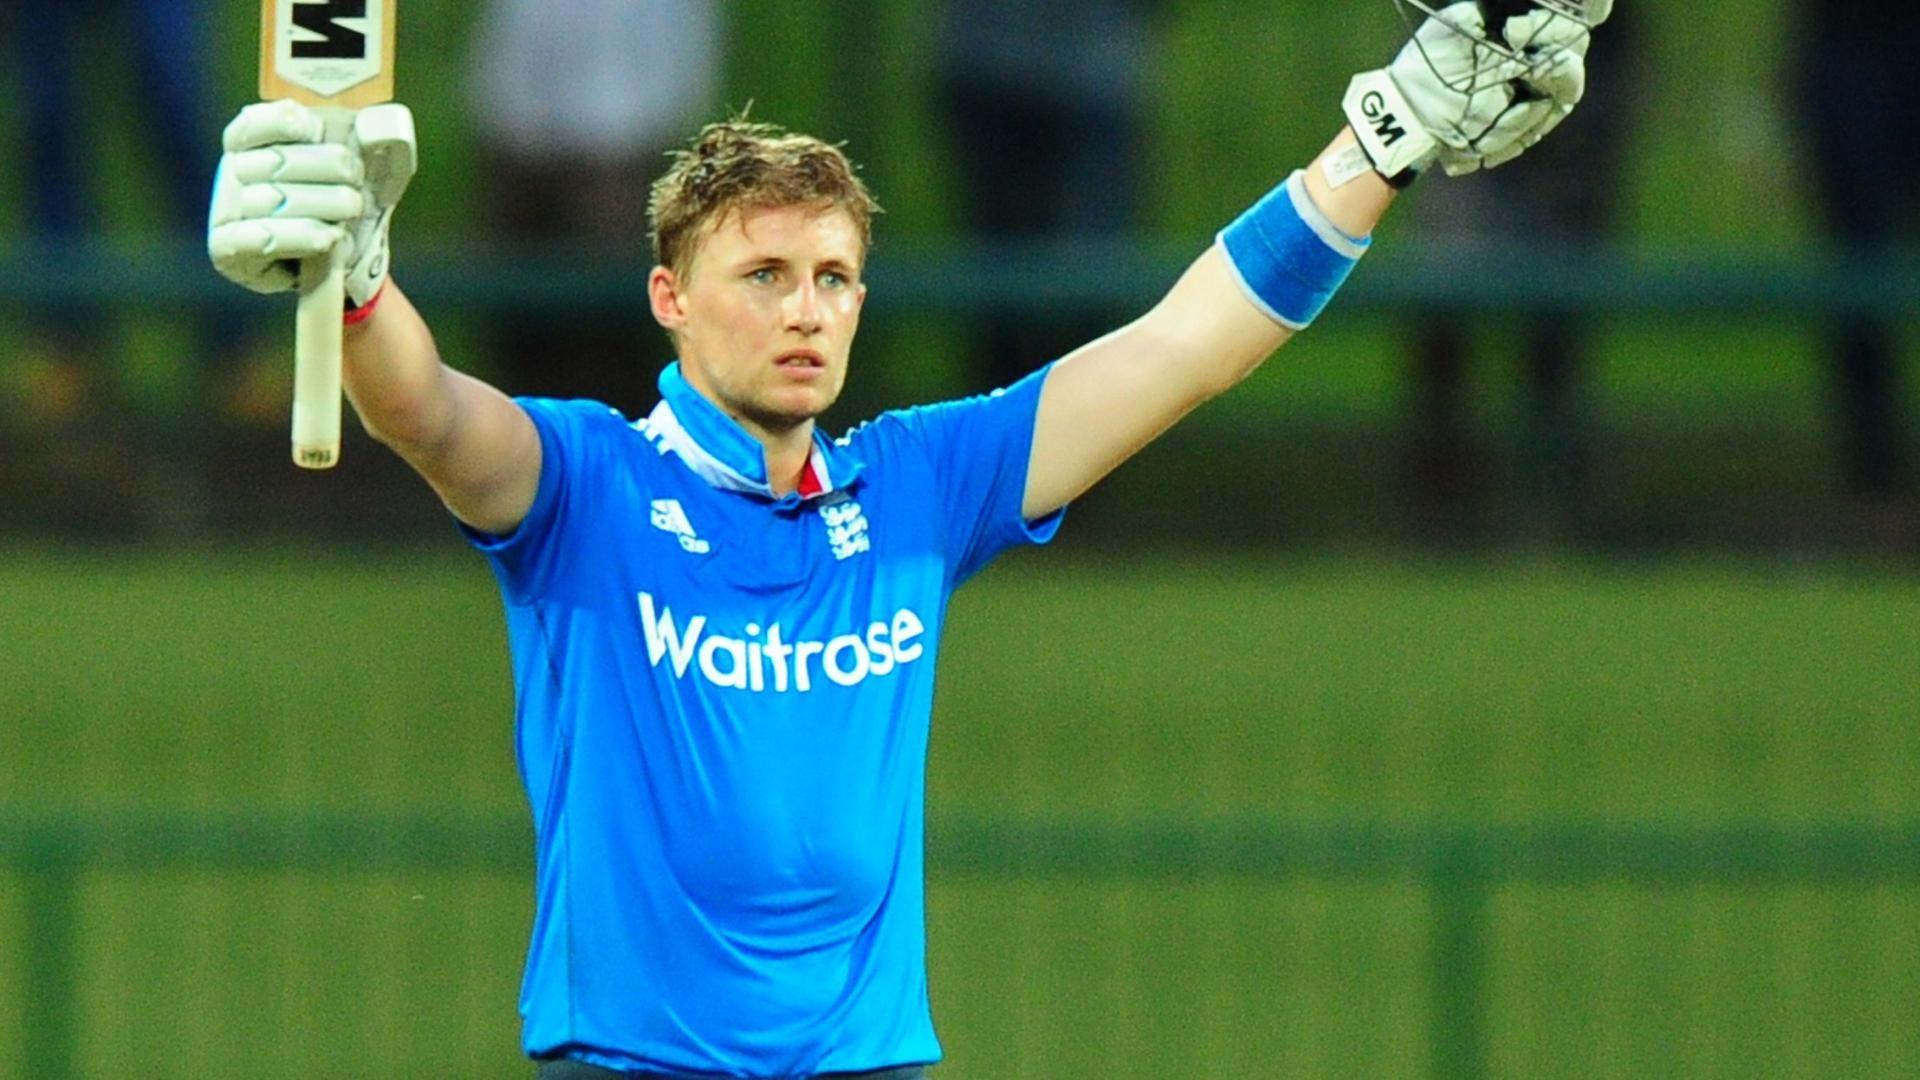 Match Analysis Sri Lanka V England 6th Odi Pallekele Kandyan